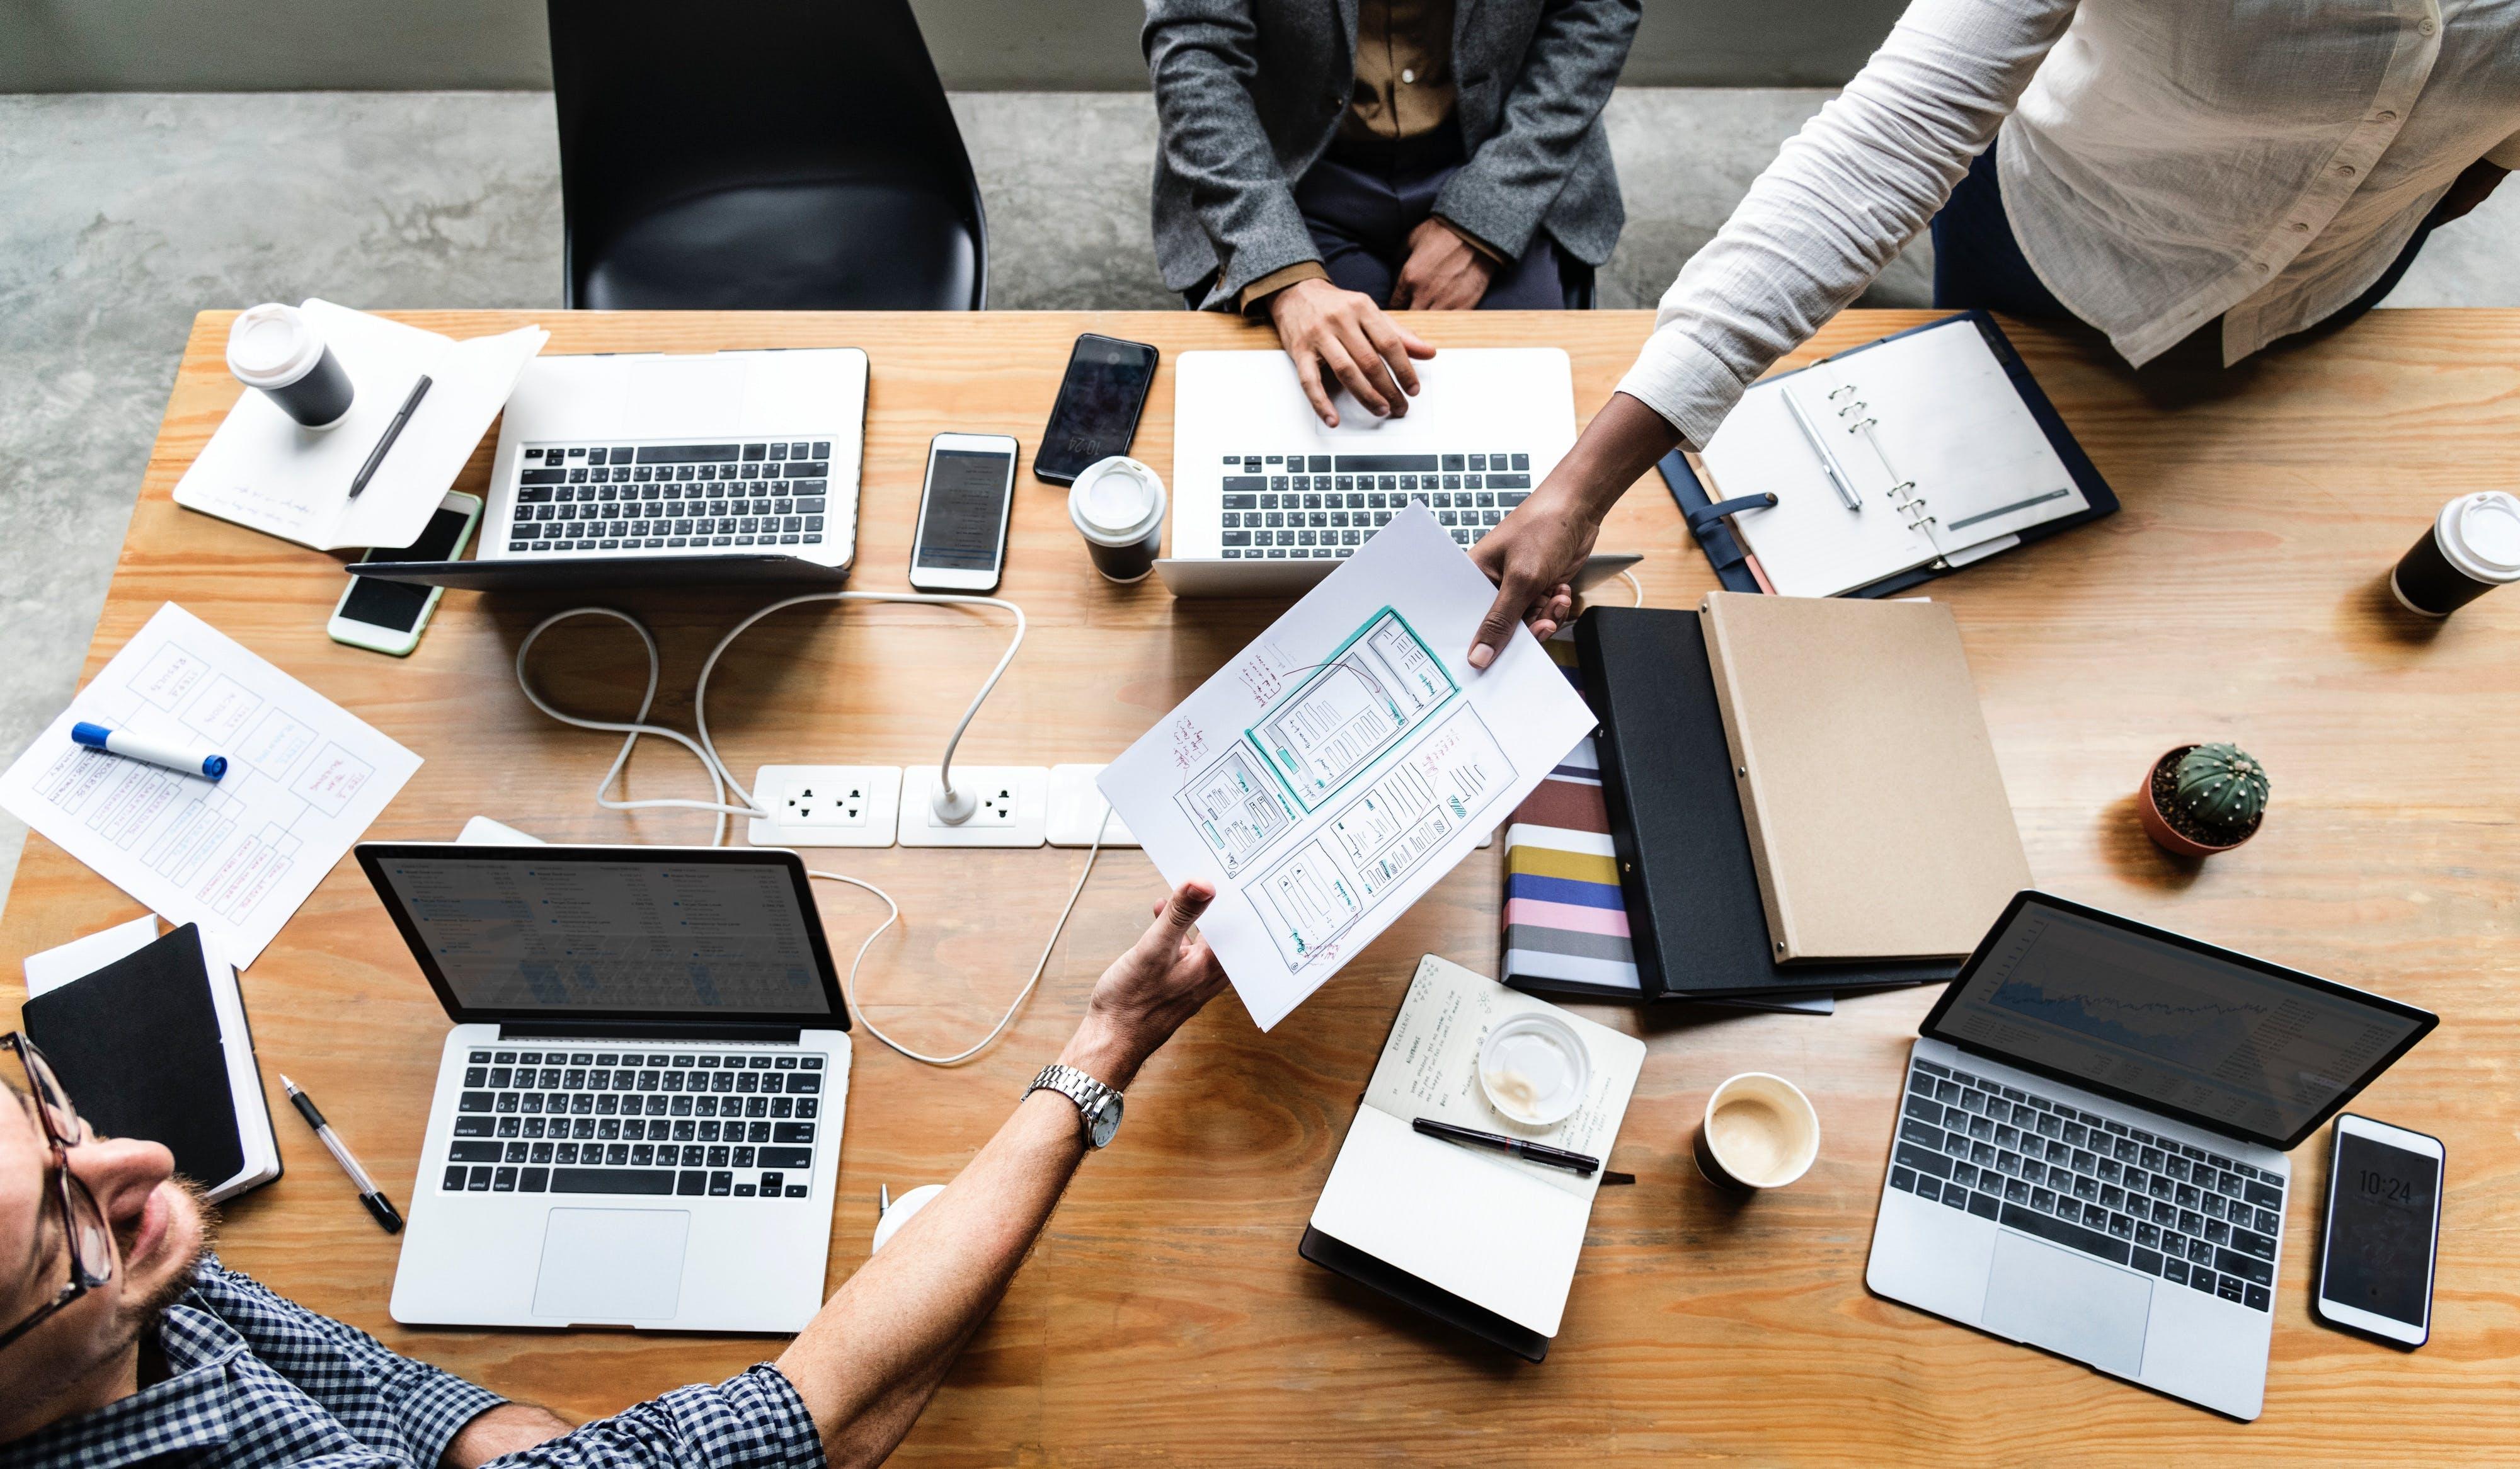 10 no-nonsense web design trends for 2018 – Econsultancy